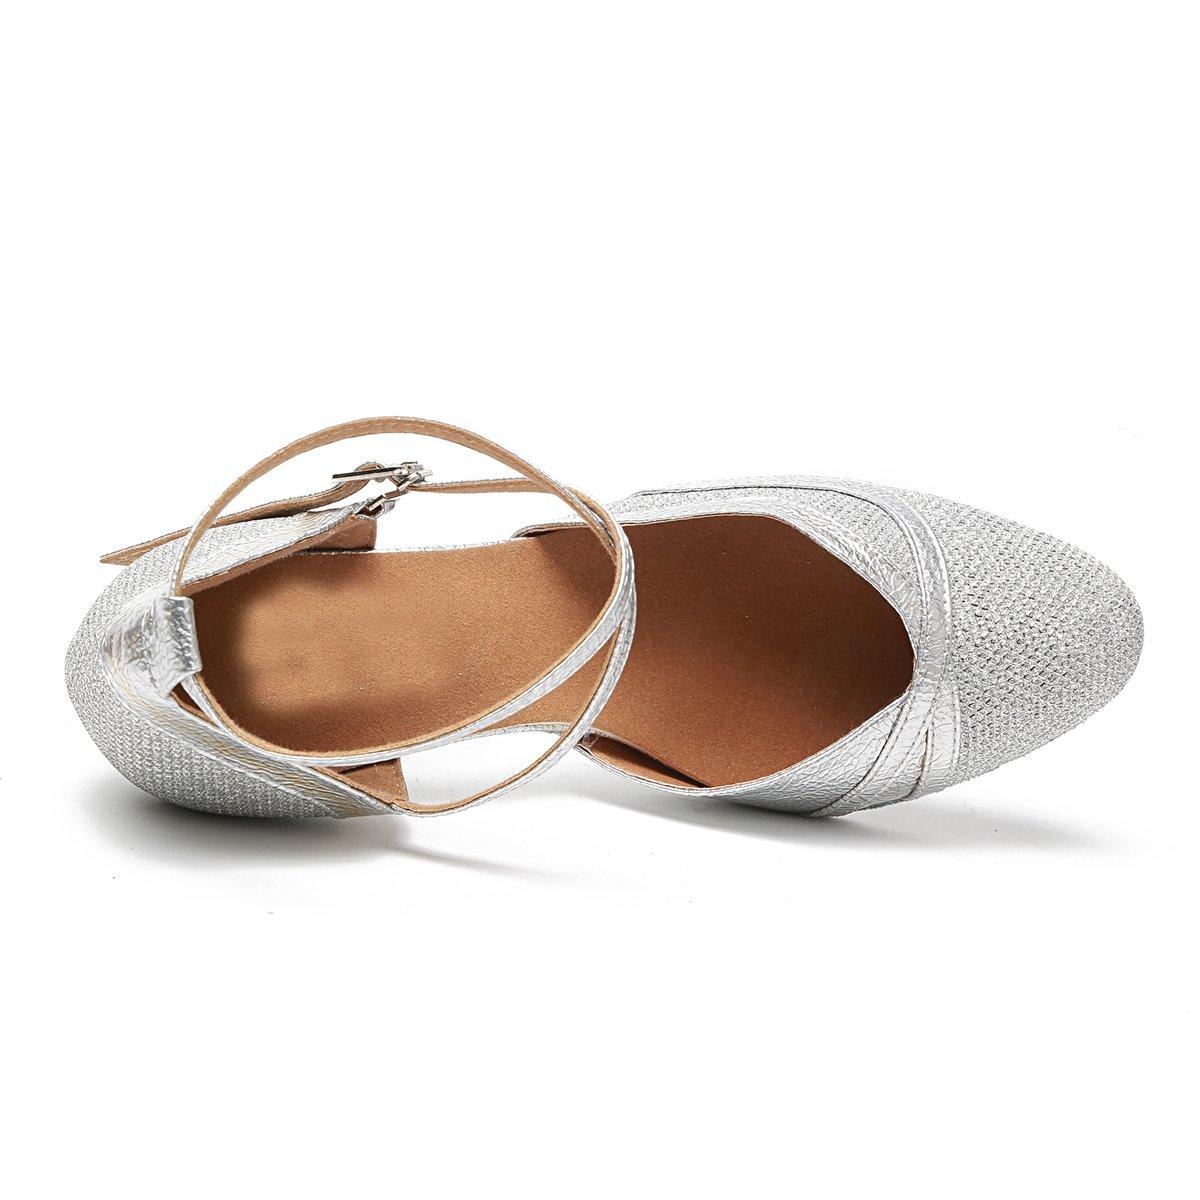 Minishion Womens Glitter Ballroom Latin Dancing Shoes Party Wedding Heels